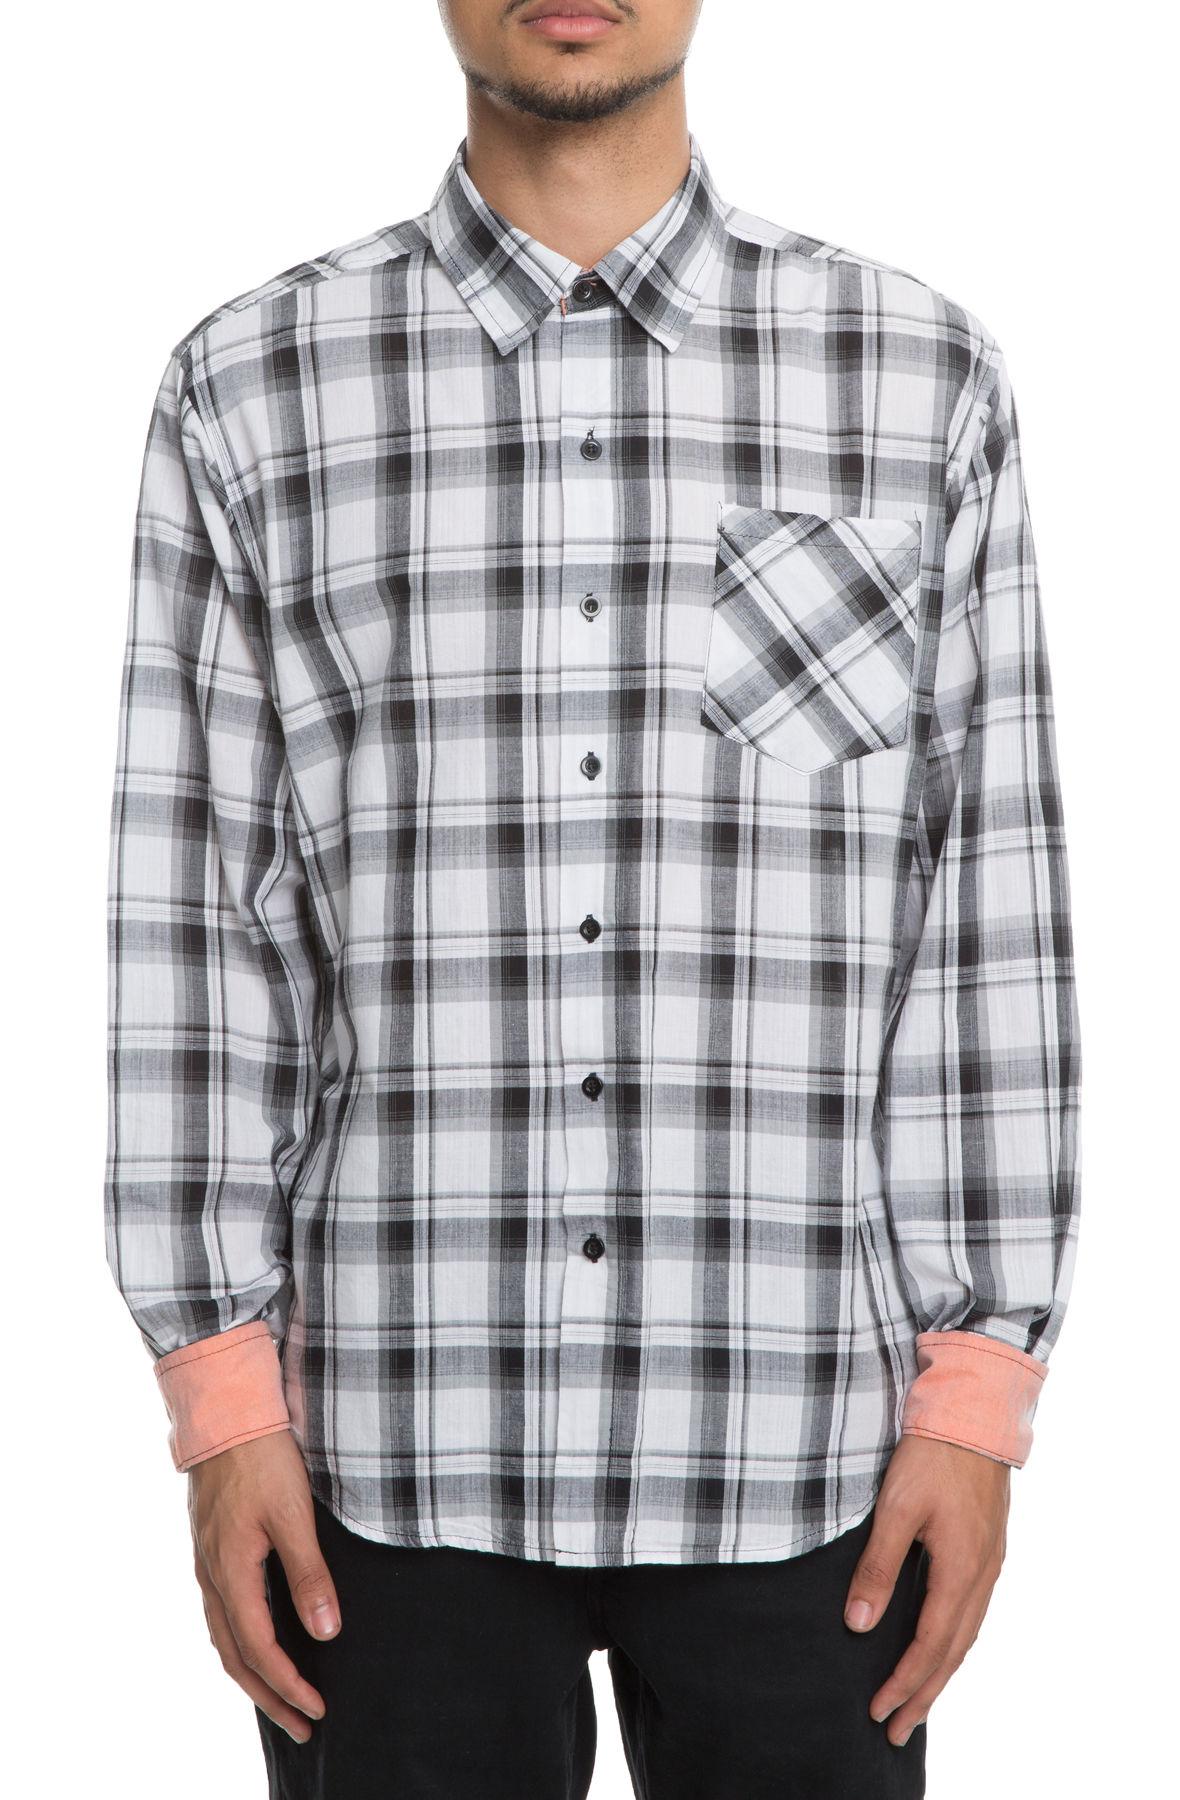 Image of Something Tried Plaid Shirt in White/Black